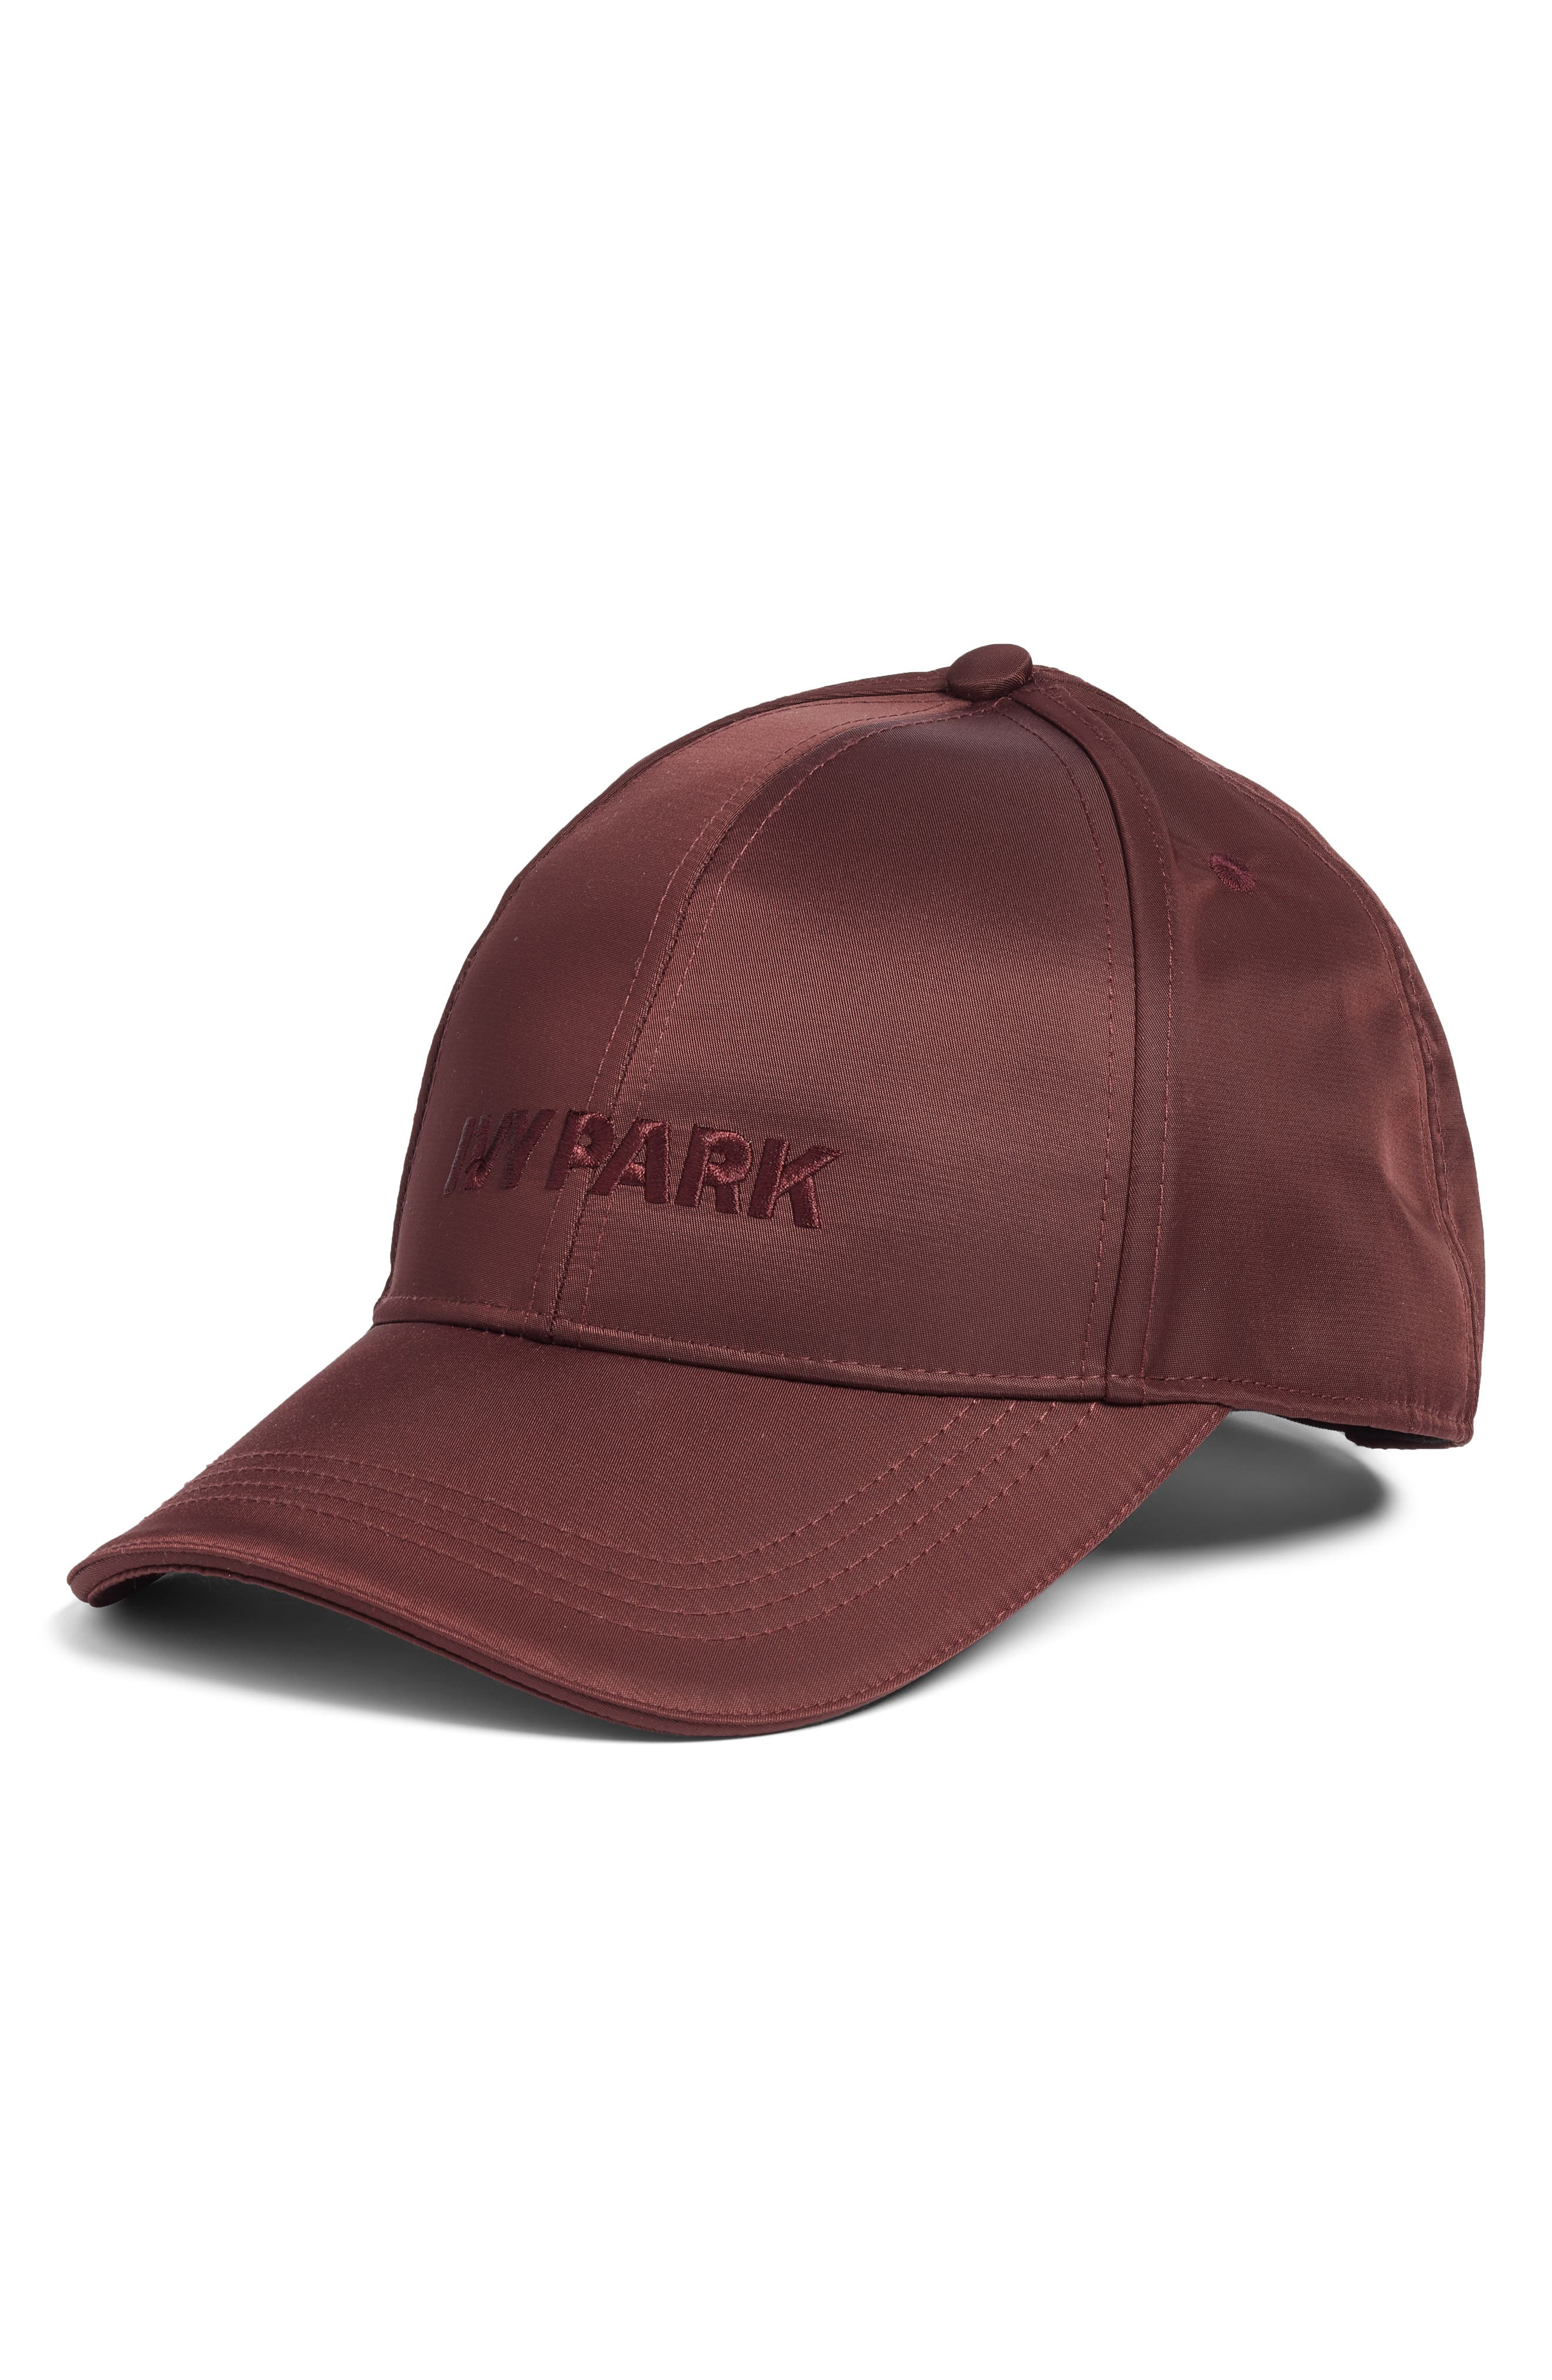 IVY PARK® Logo Baseball Cap